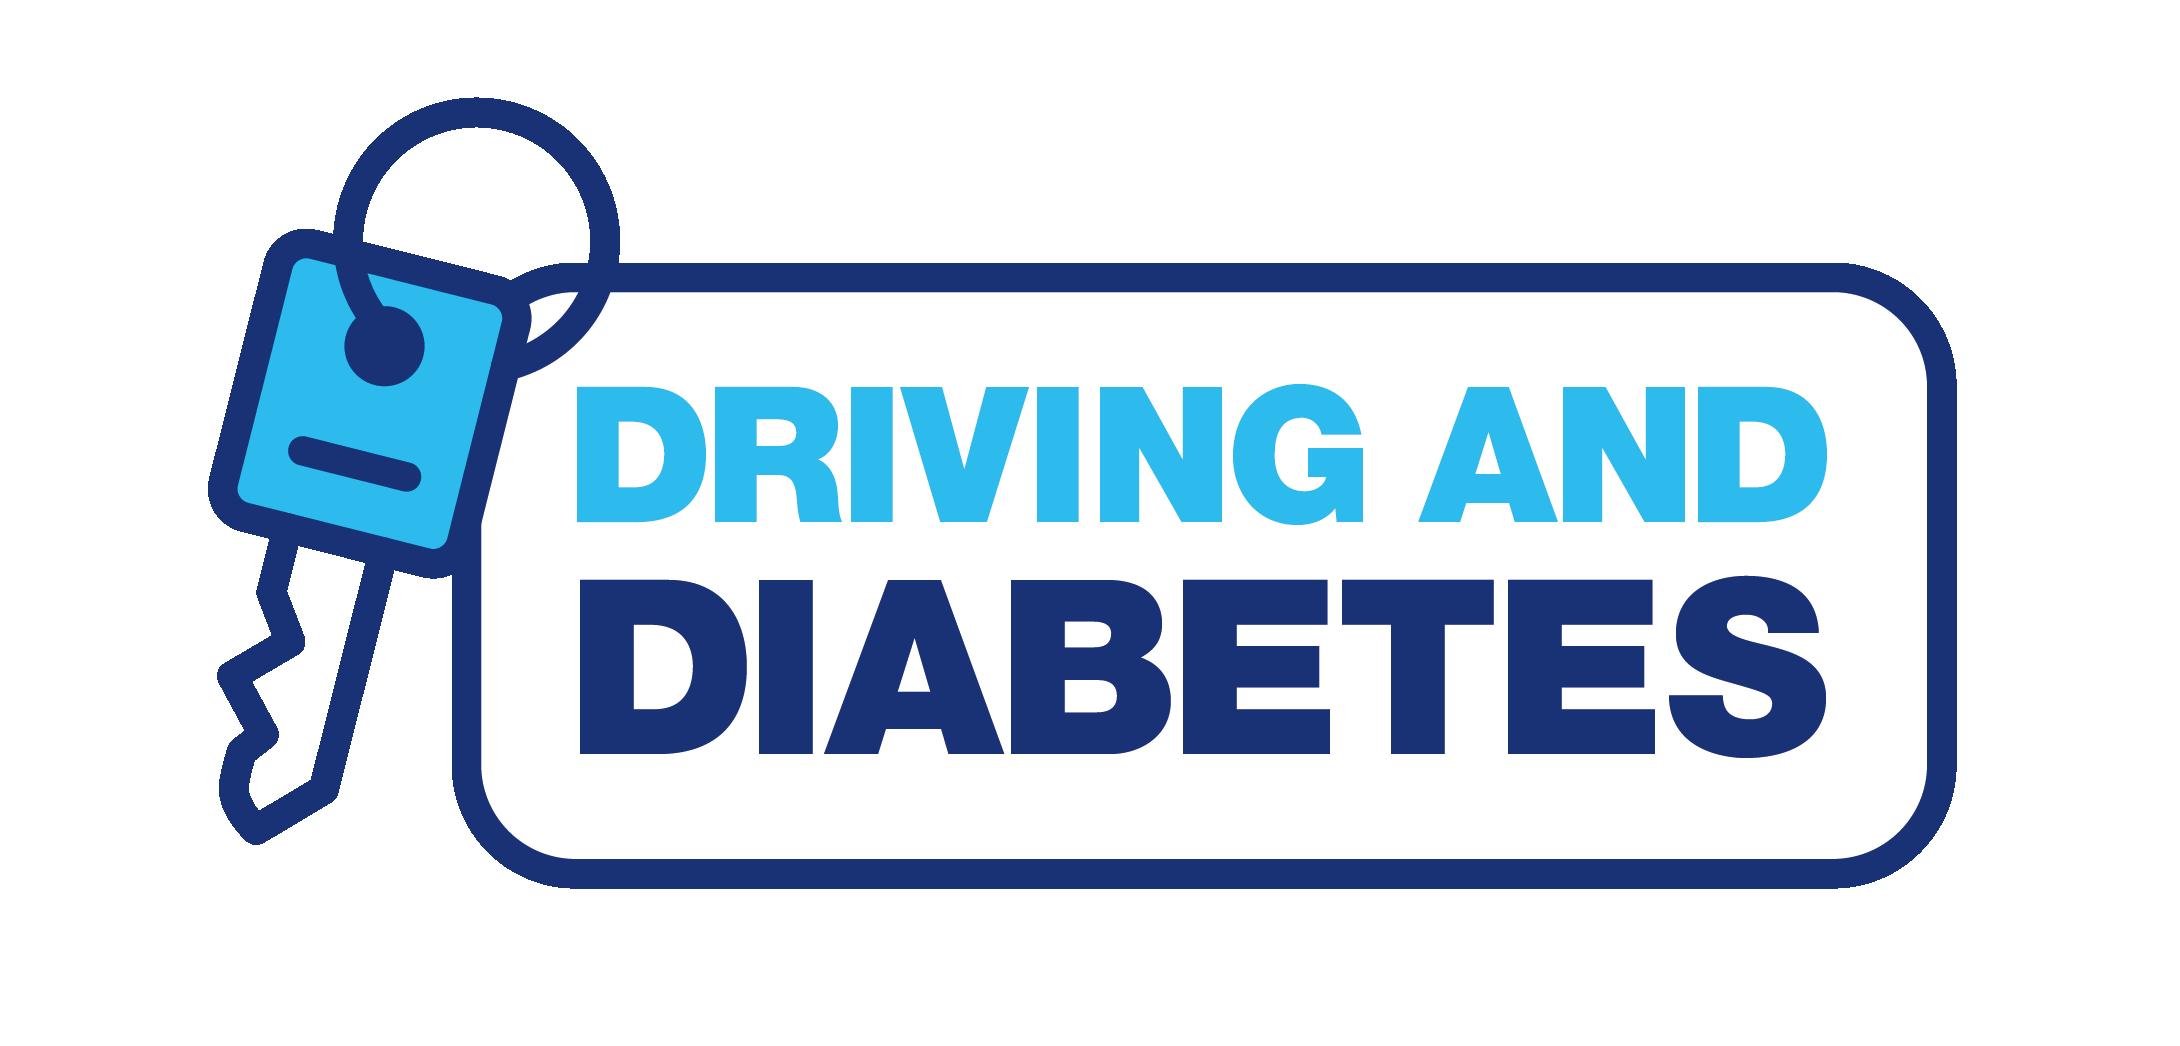 Pills clipart diabetes medication. Campaign successes uk